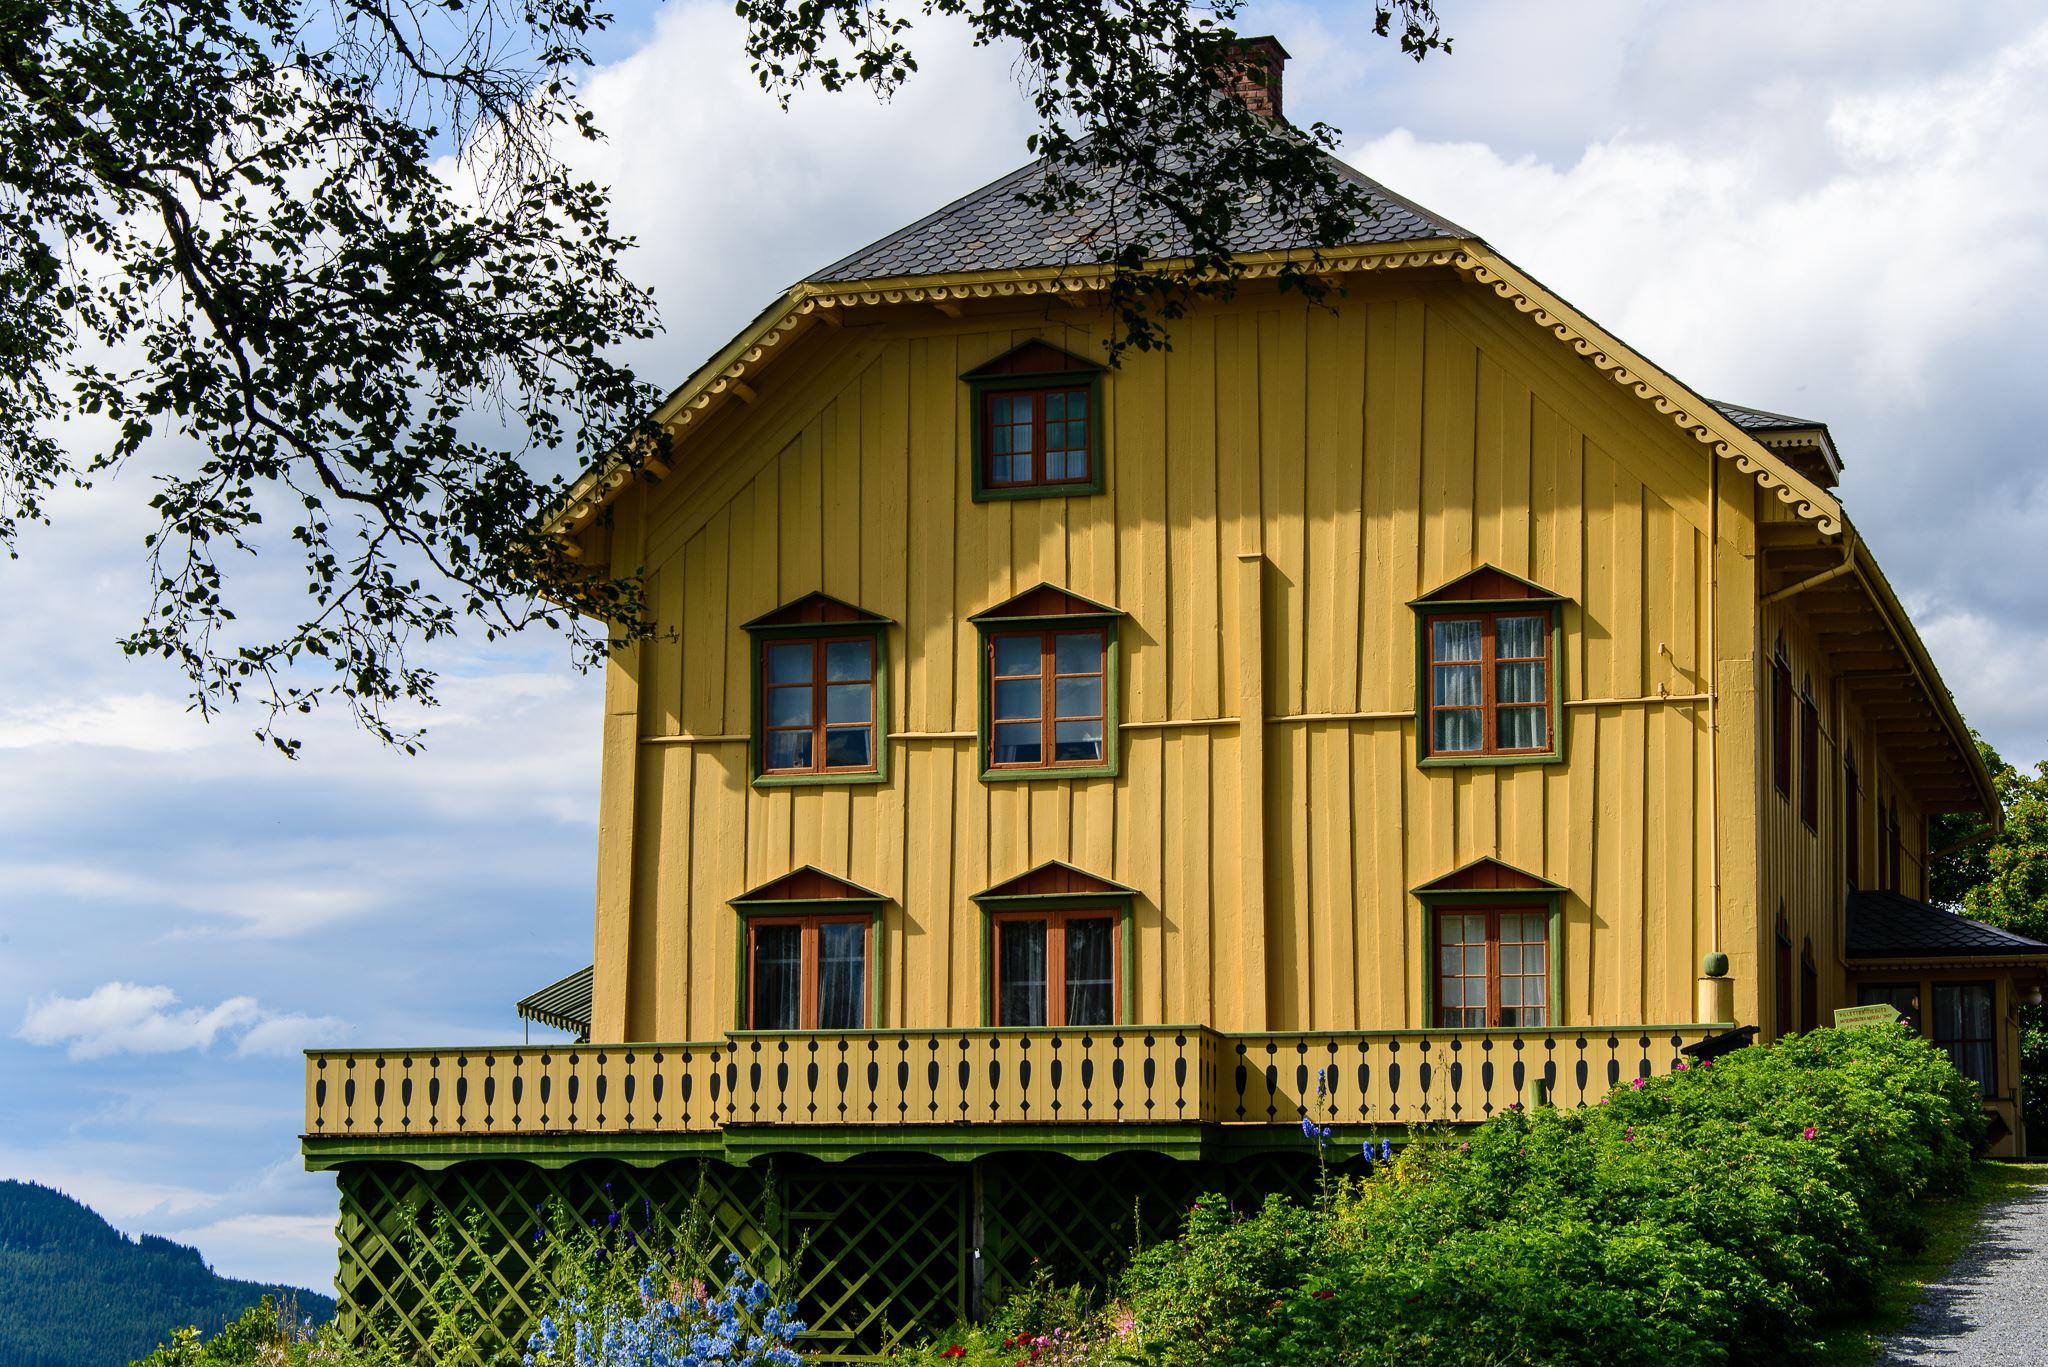 Aulestad – das Zuhause von Bjørnstjerne Bjørnsons